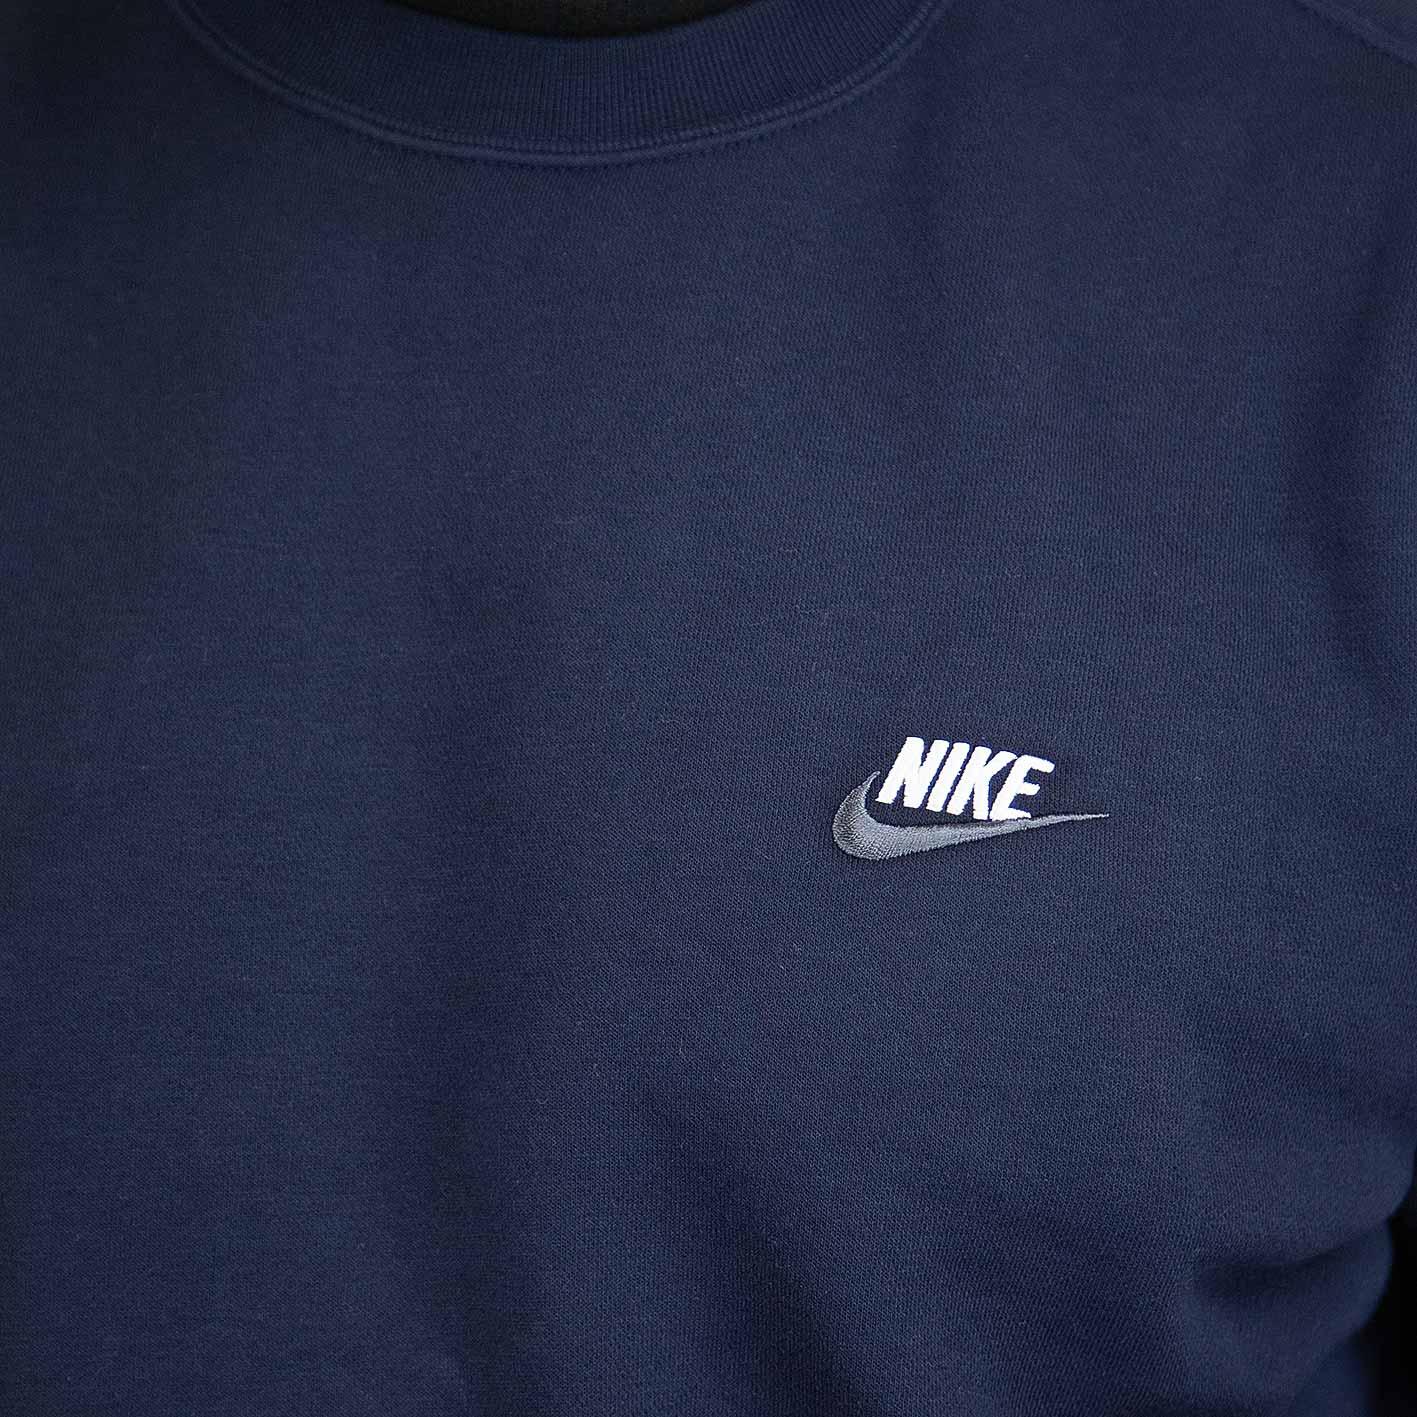 Nike Dunkelblau Dunkelblau Nike Pullover Pullover Nike L543RjcAq